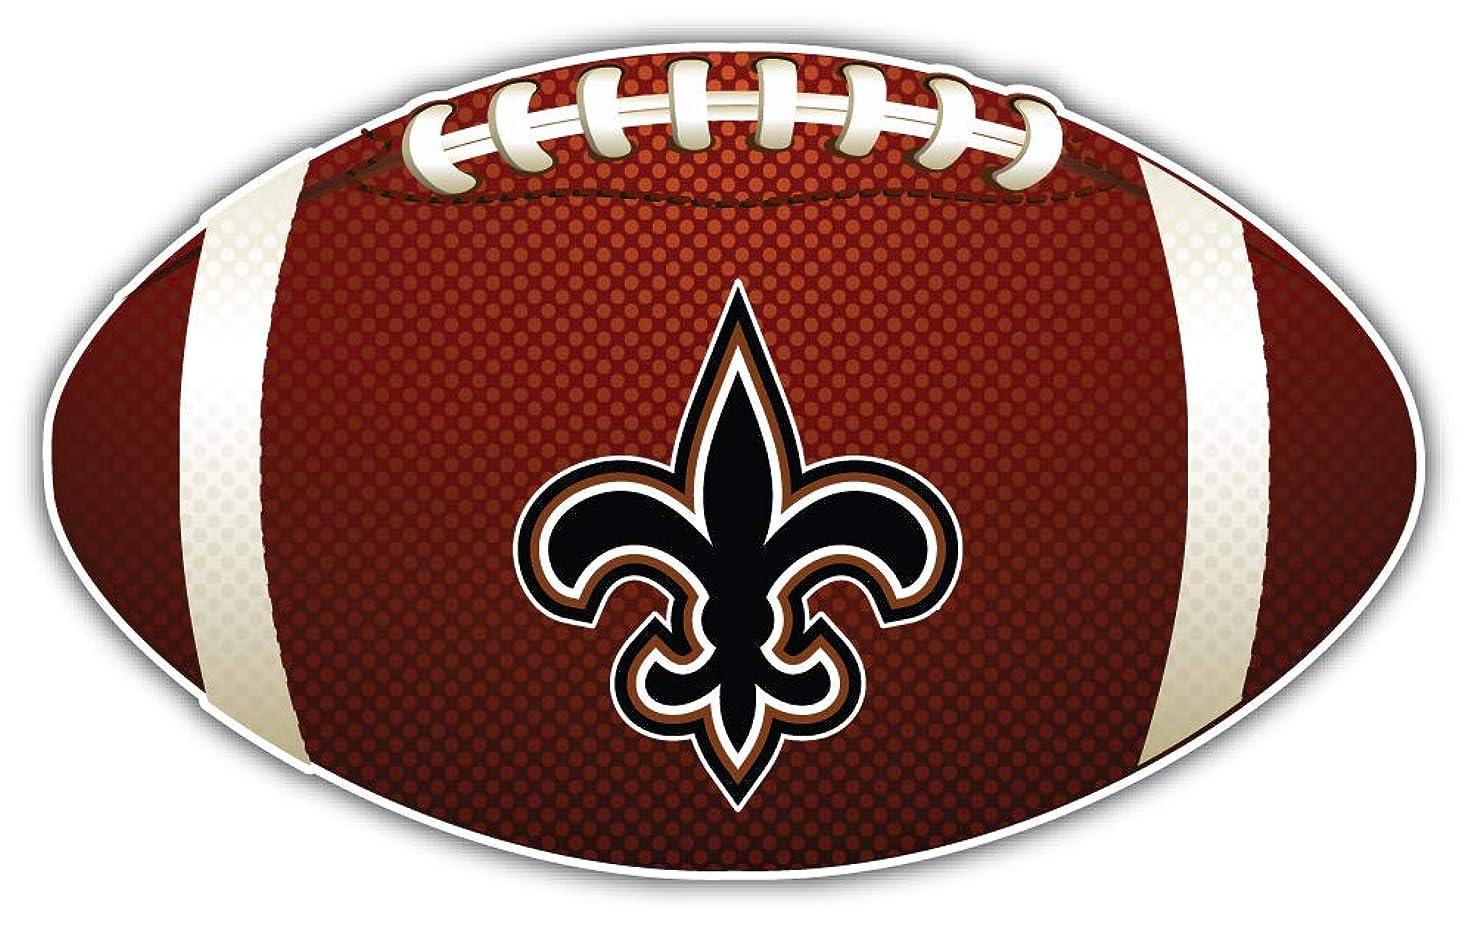 New Orleans Saint Symbol NFL Logo Ball Sticker Car Bumper Decal 5'' X 3''